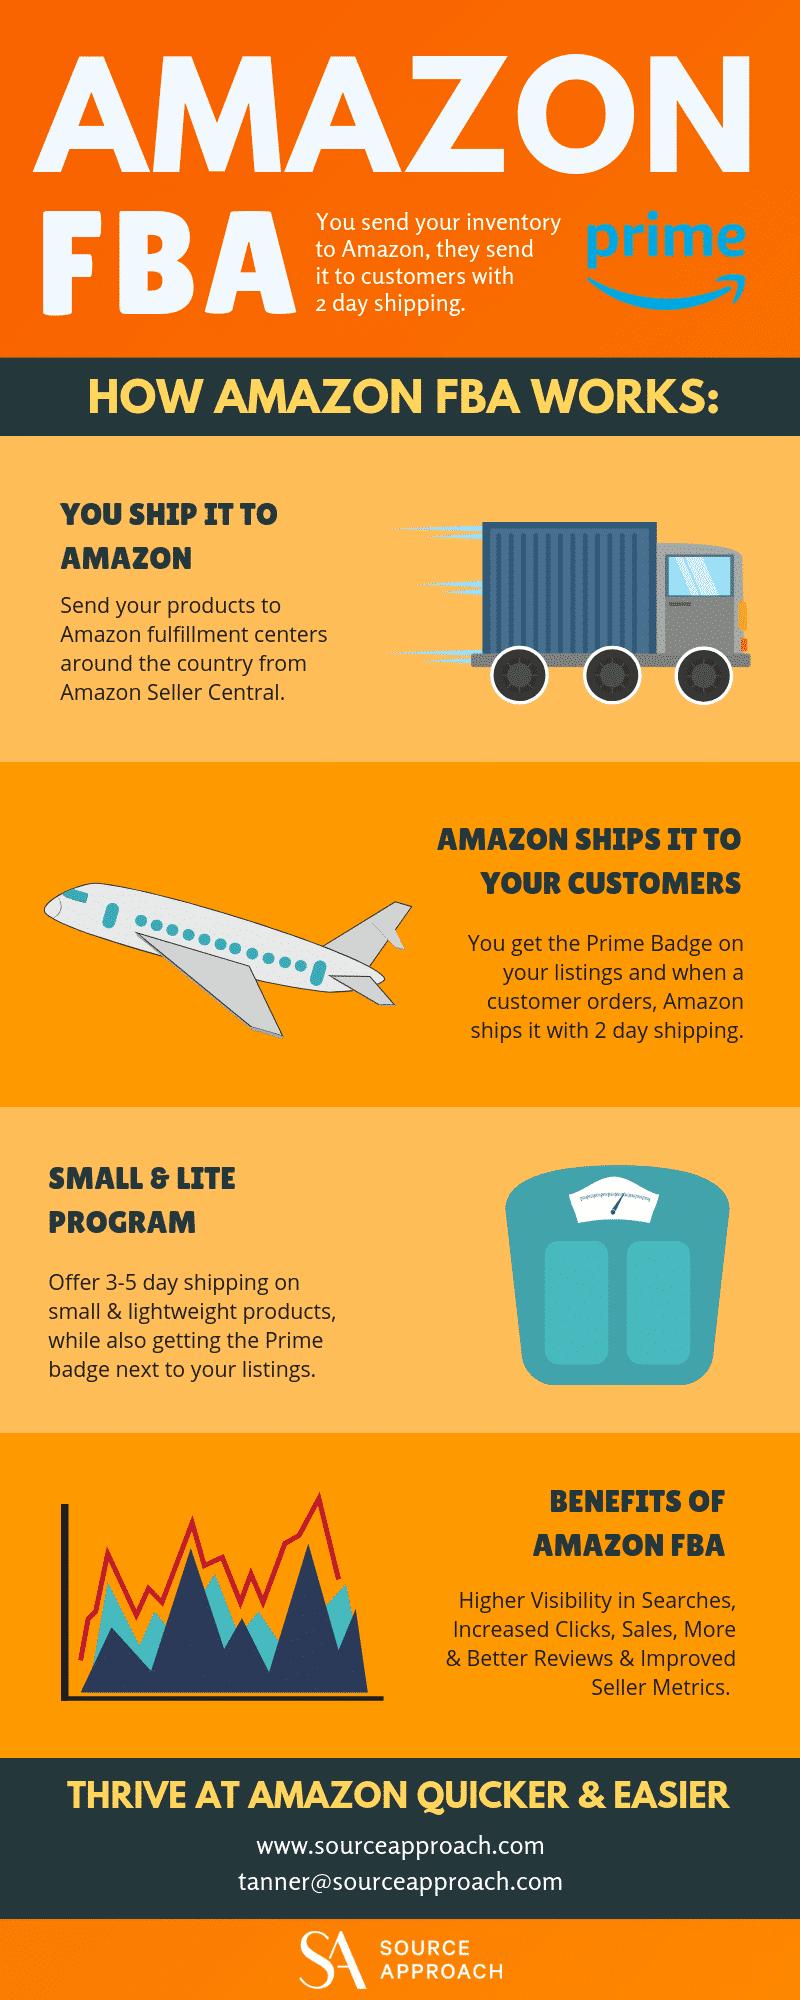 How Does Amazon FBA Work - INFOGRAPHIC